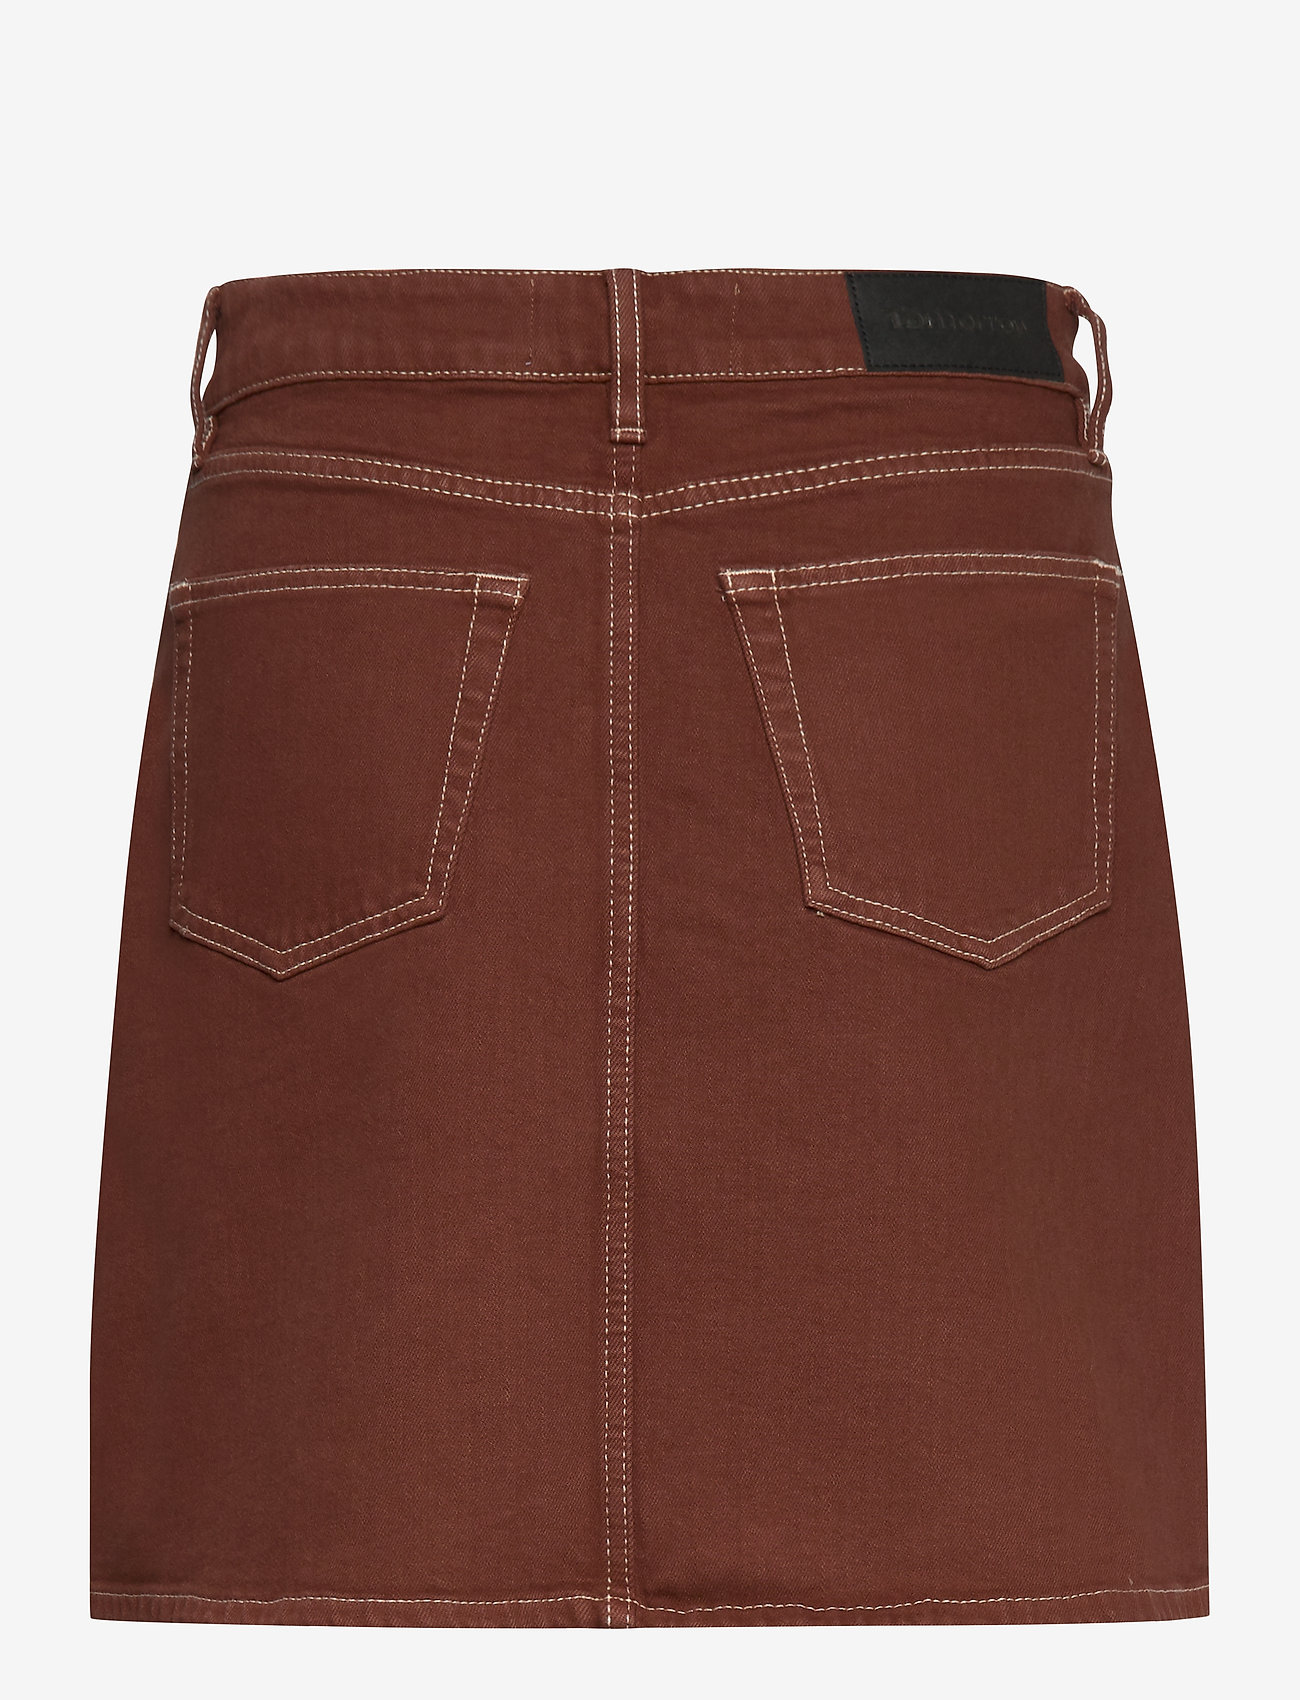 Tomorrow - Mandela denim skirt color - kurze röcke - coffee brown - 1